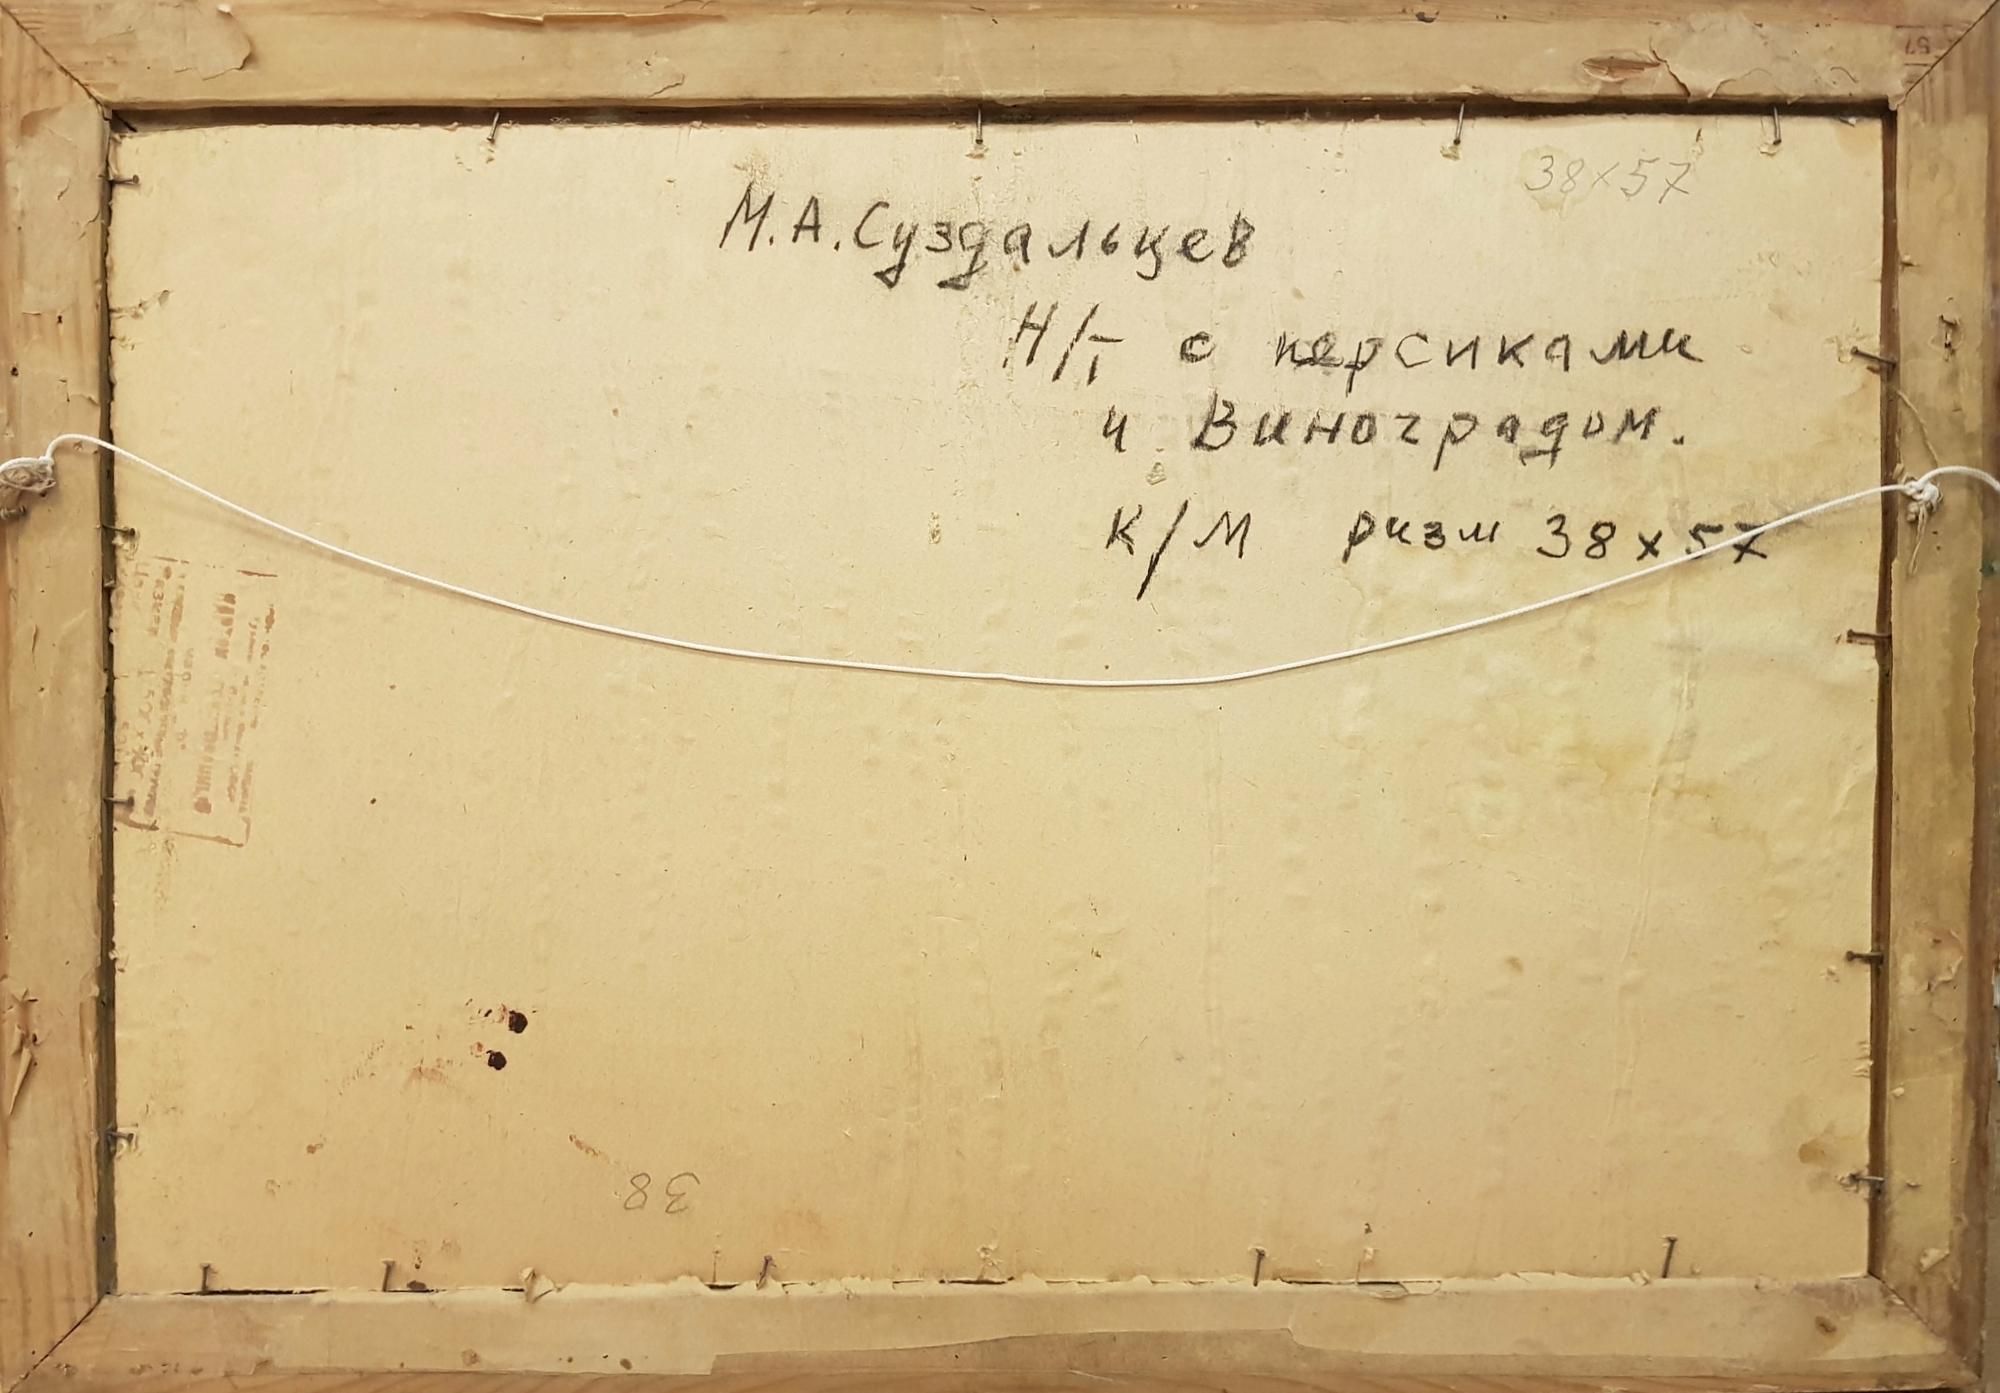 Оборот. Суздальцев Михаил Аркадьевич. Натюрморт с персиками и виноградом